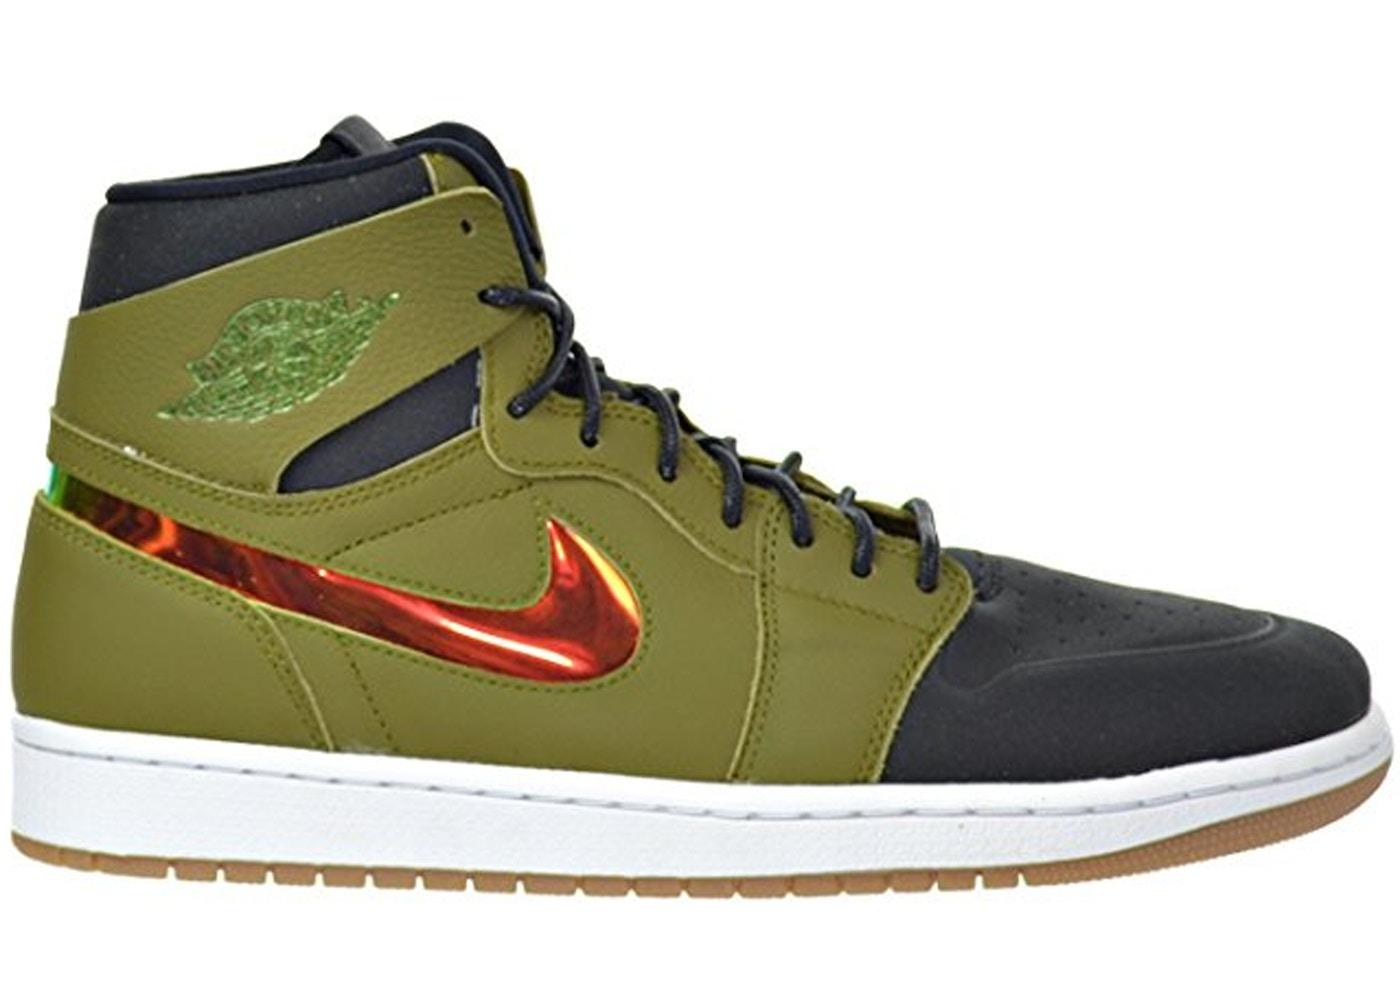 d9ae2f6c71e4 Air Jordan 1 Size 13 Shoes - Volatility